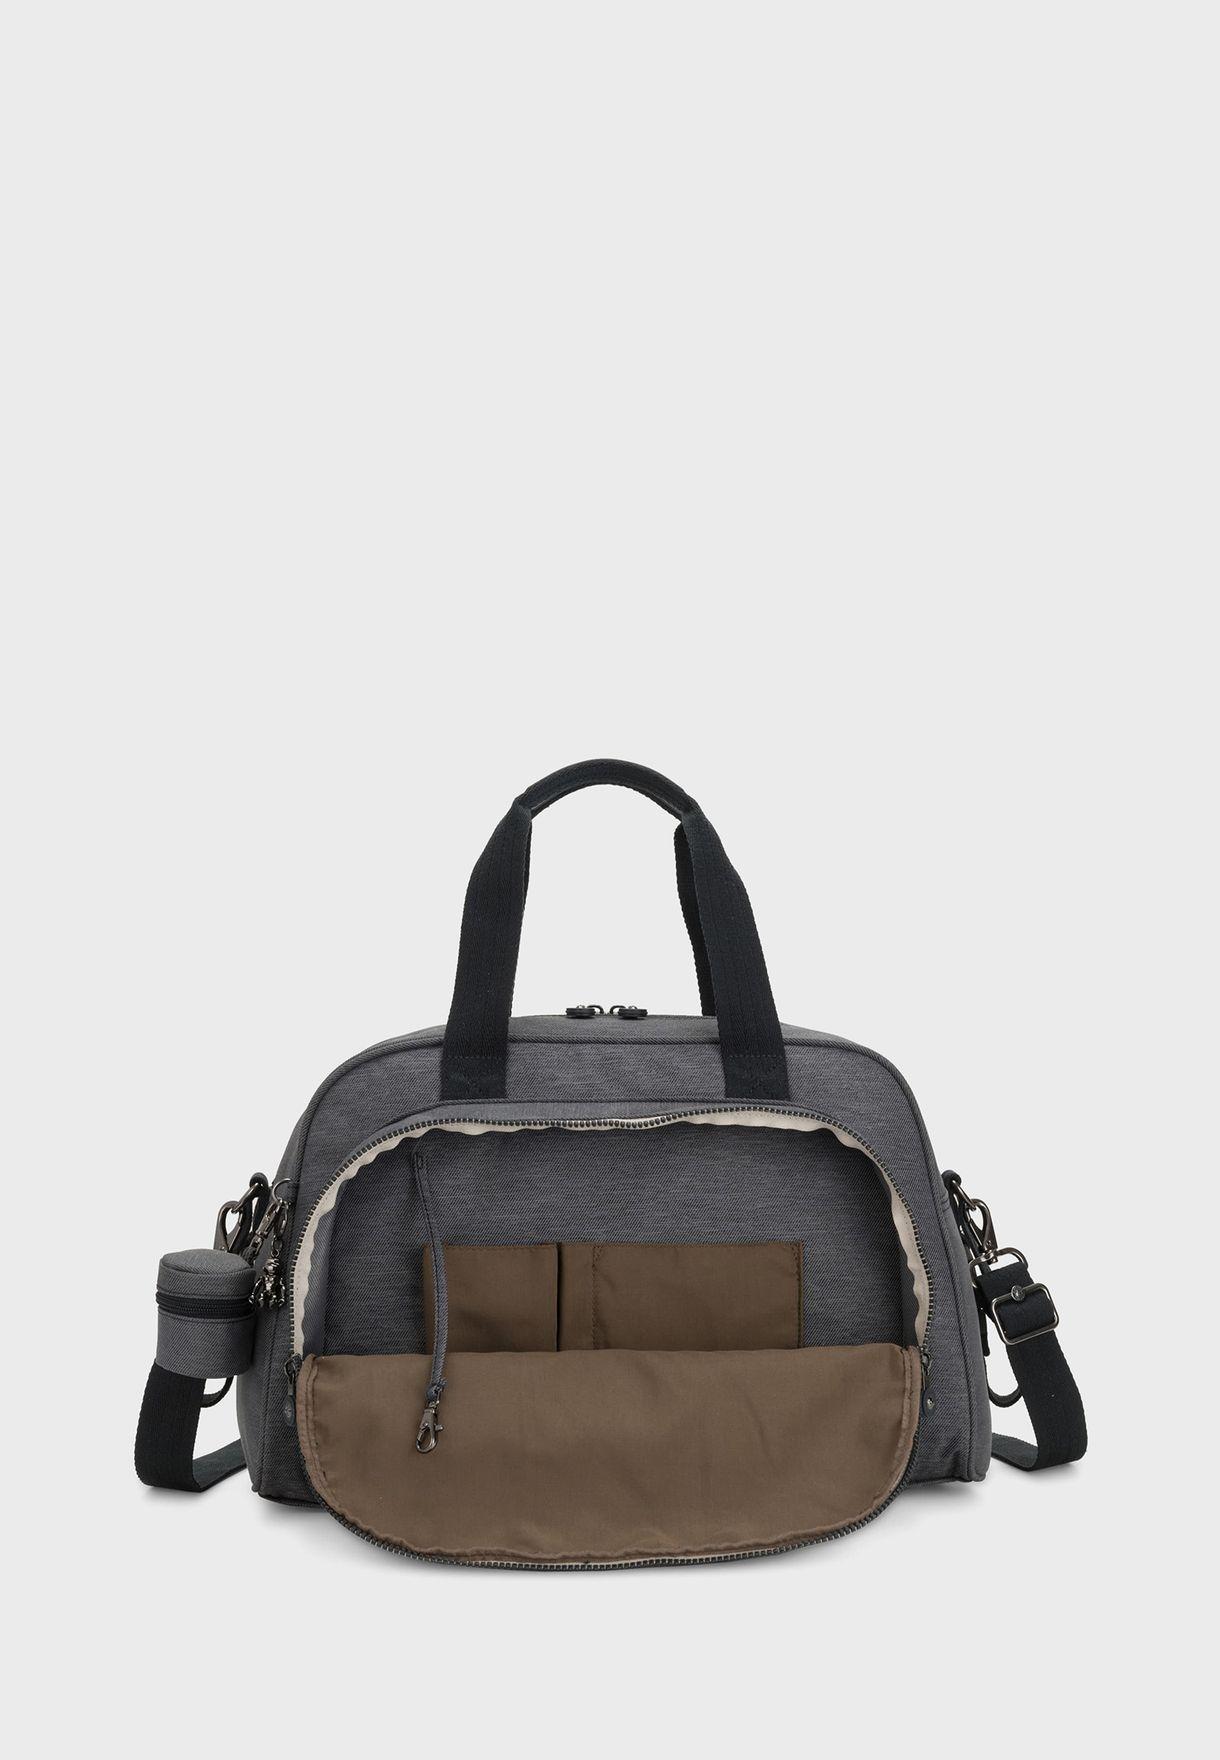 Camama Speckled Bag